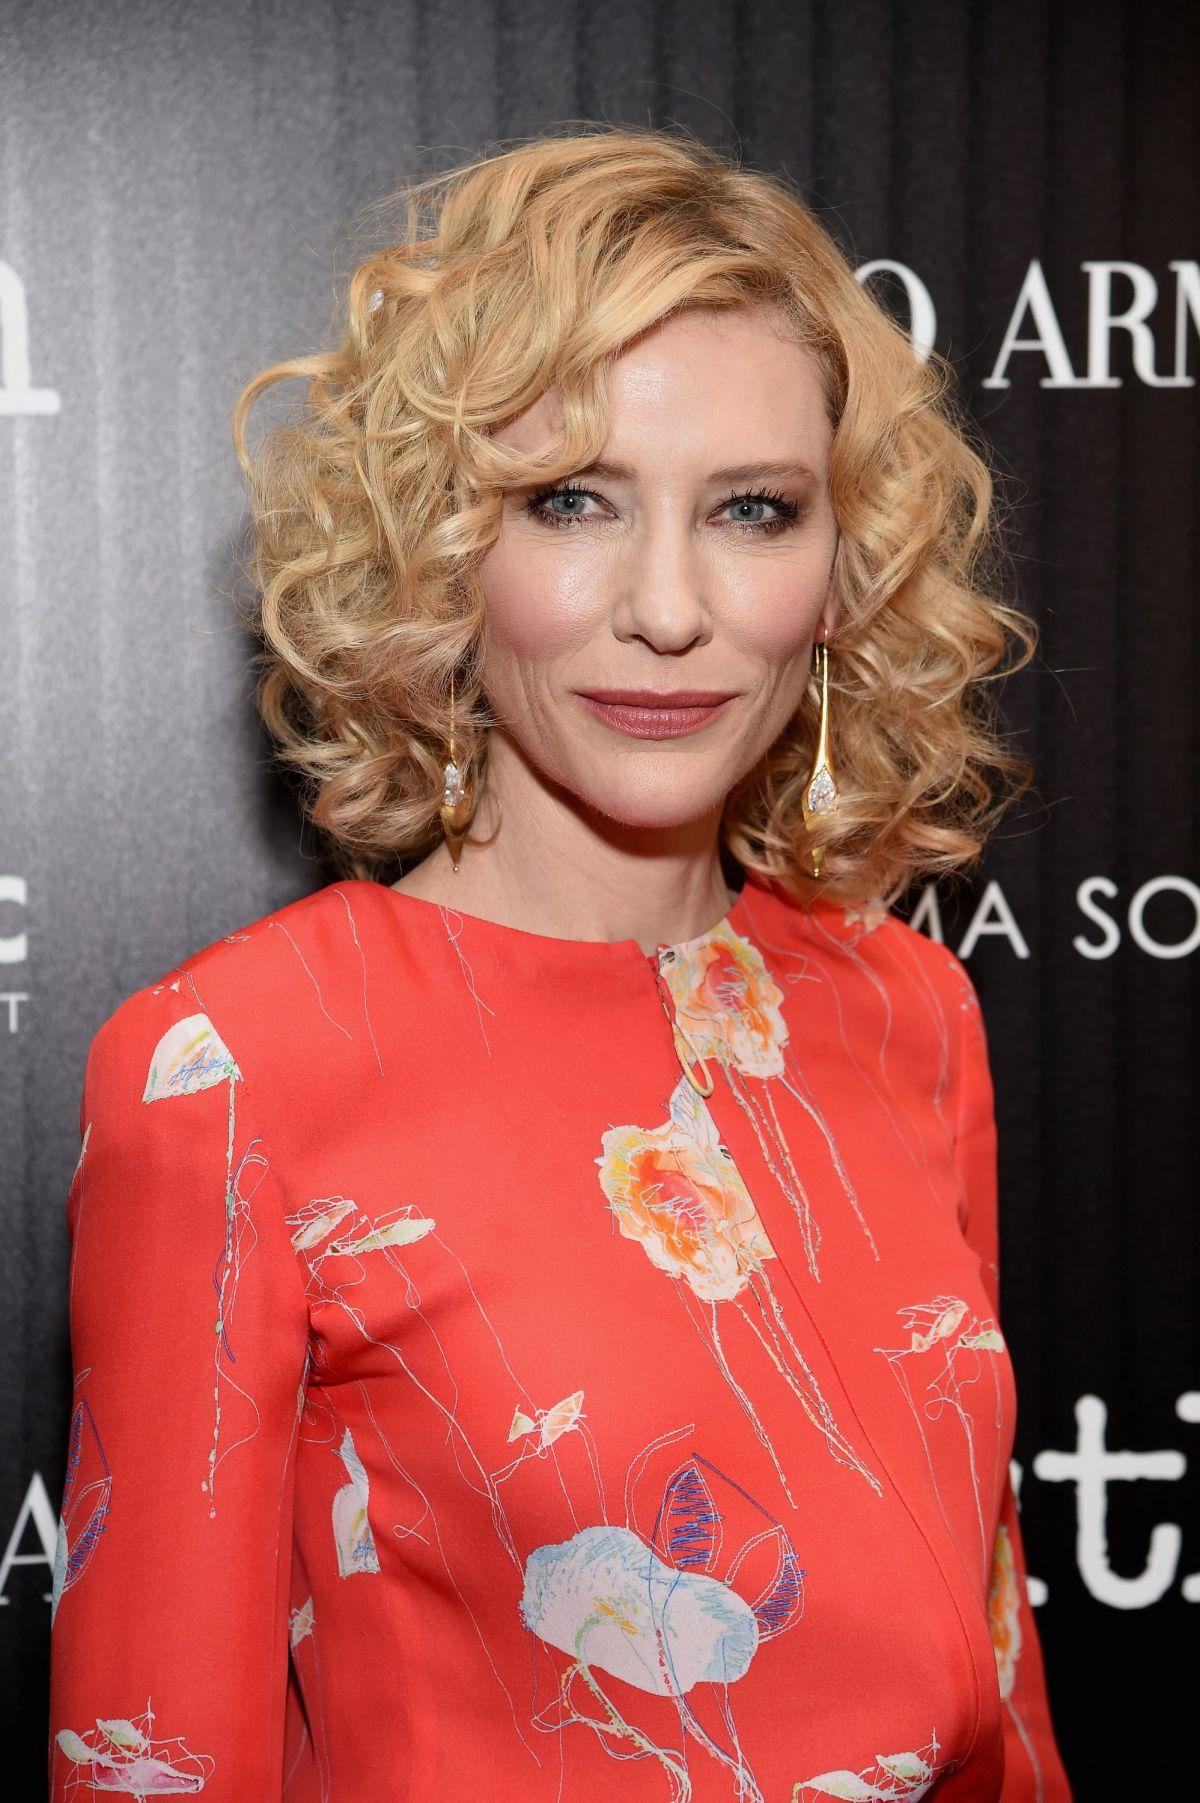 CATE BLANCHETT at Truth Premiere in New York 10/07/2015 ... Cate Blanchett